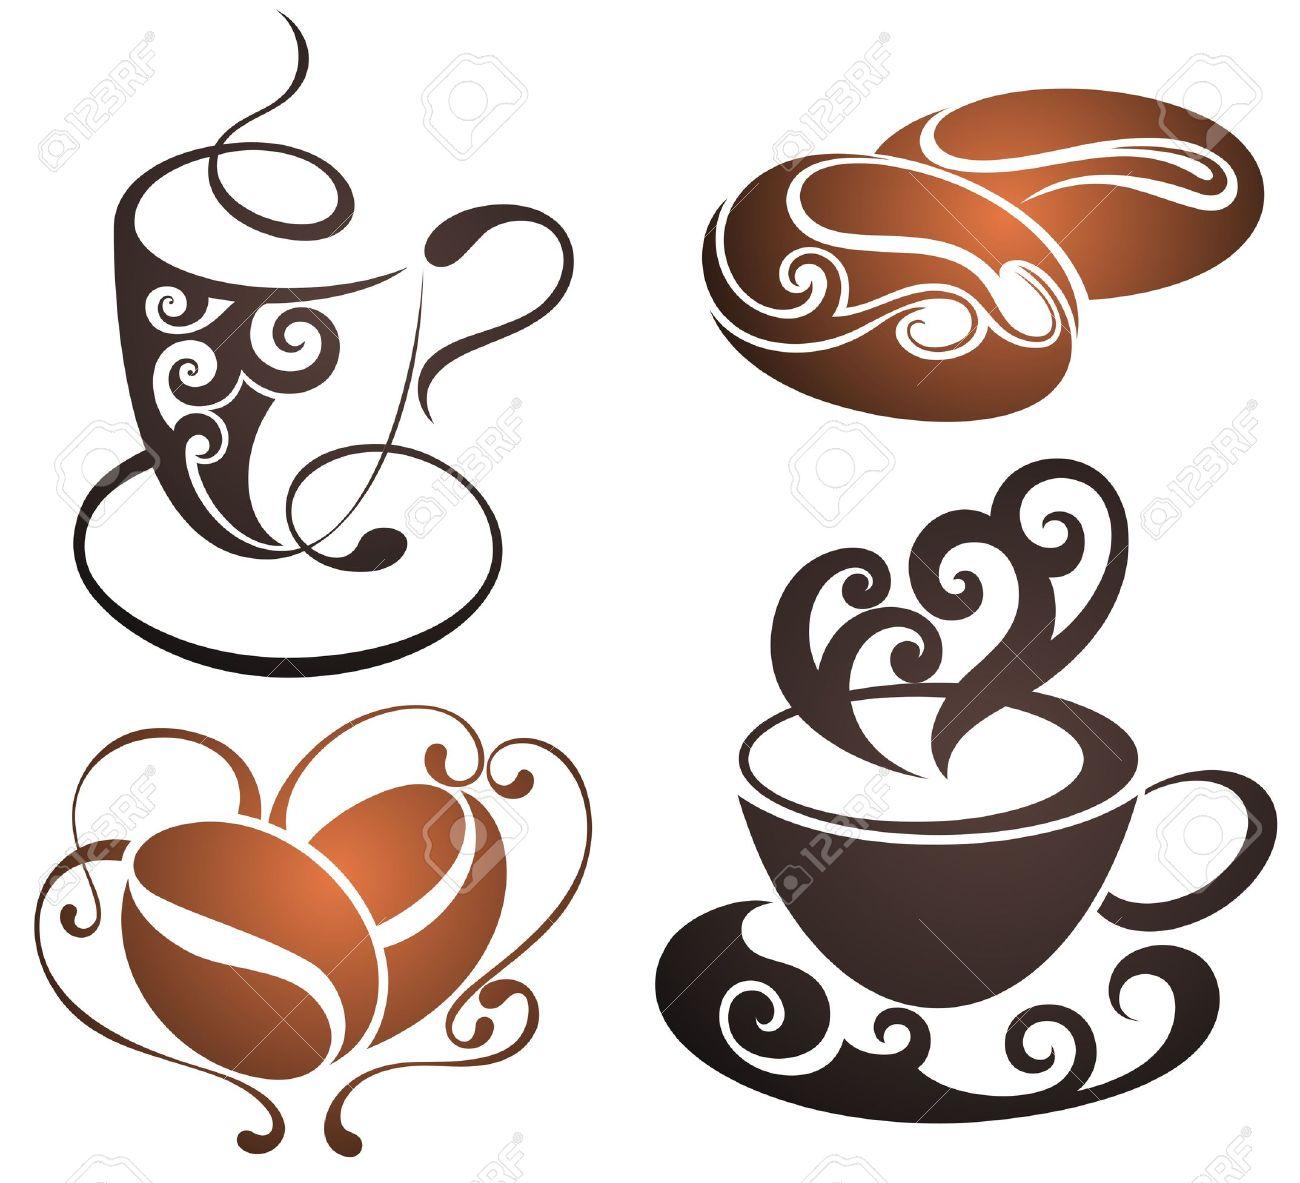 Coffee cup vector free - Coffee Cup Vector Stock Vector 47756426